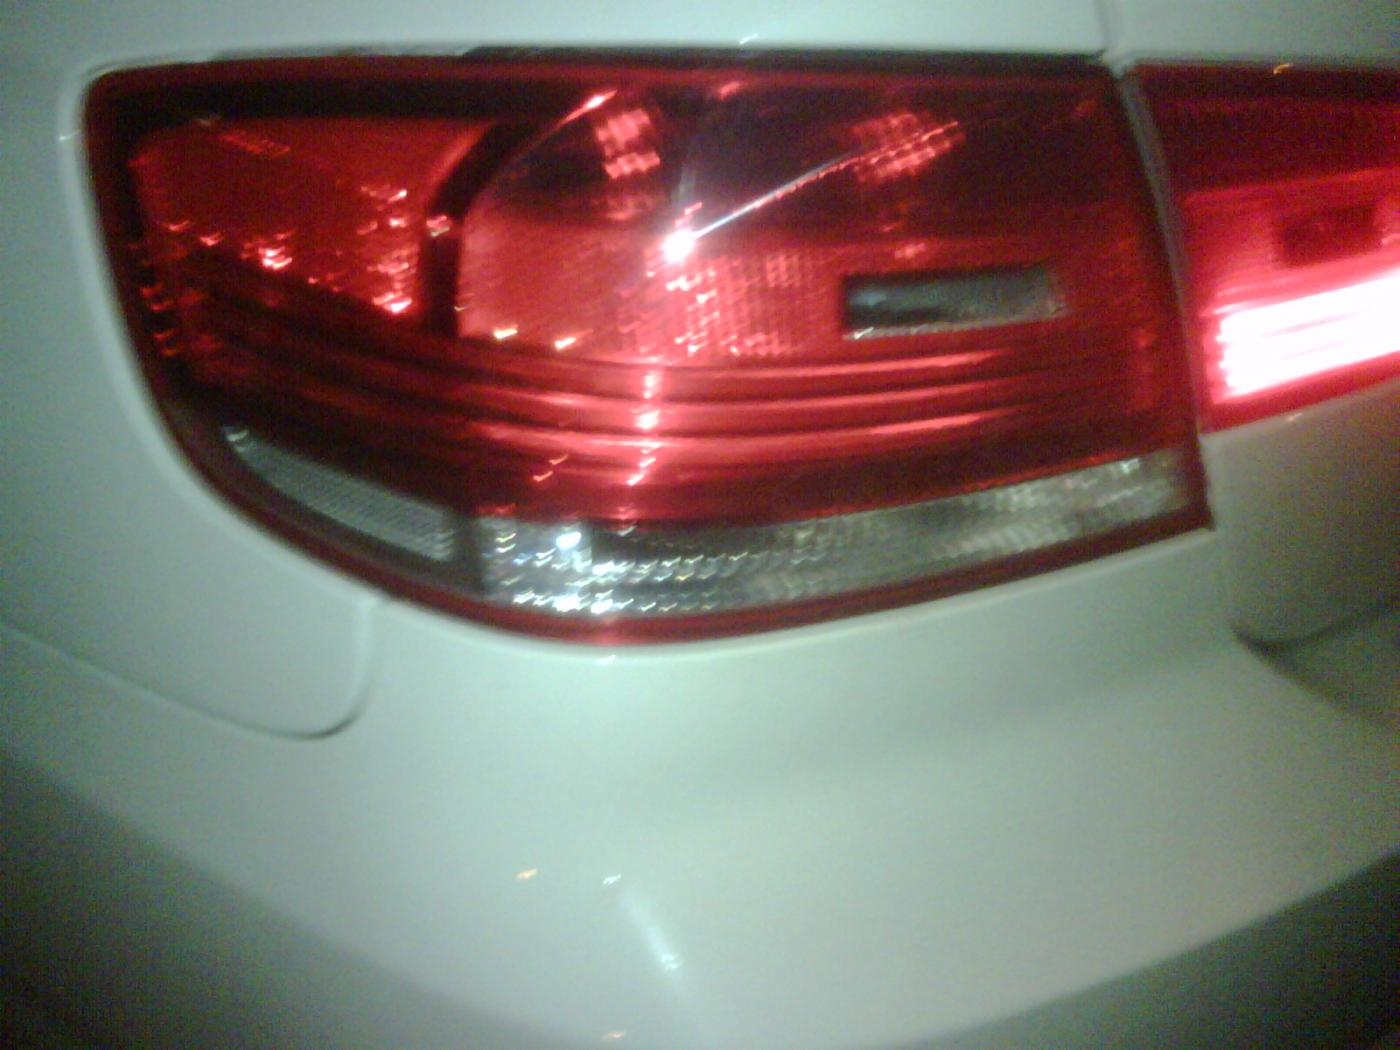 Left rear light outage - e92 - Please help.